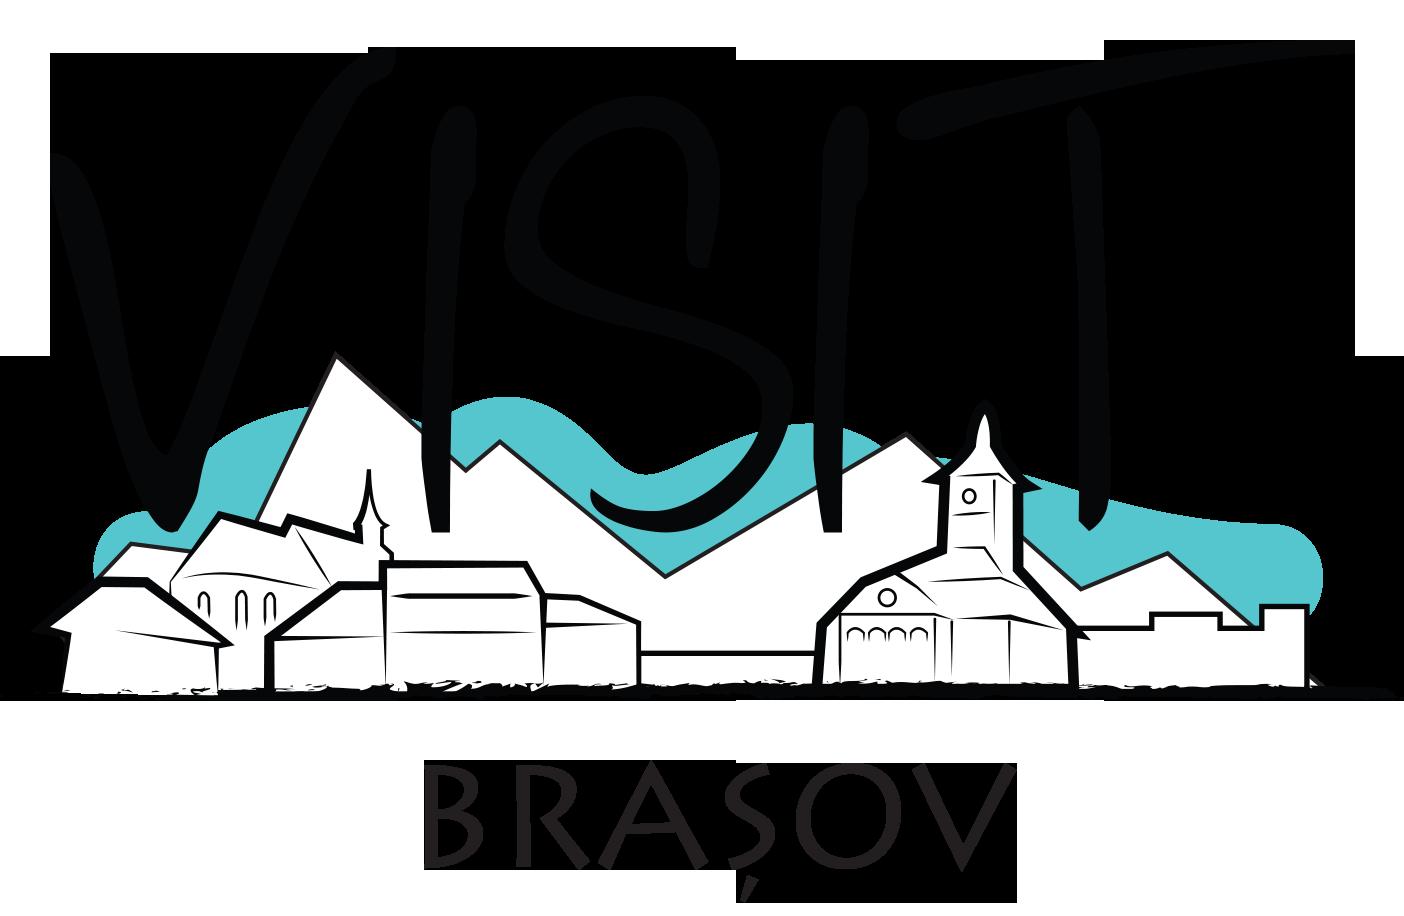 Visit Brasov